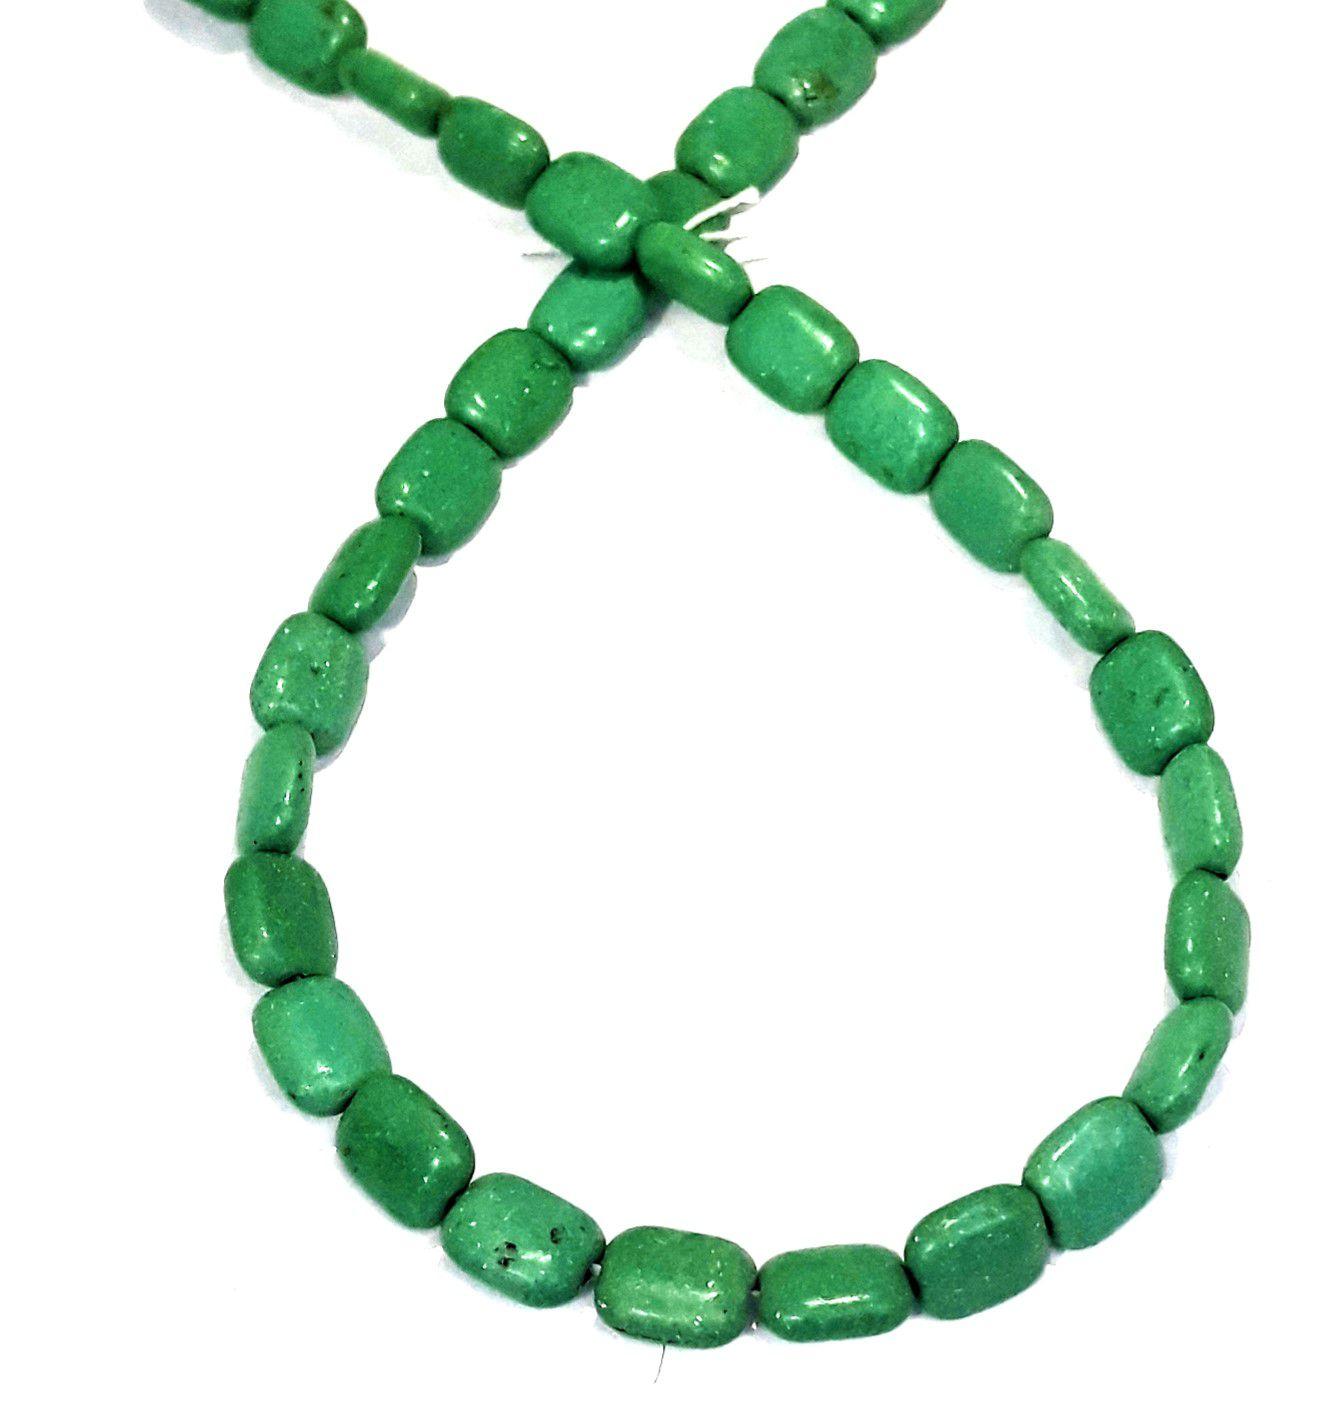 Pedra Turquesa Verde - PDT05